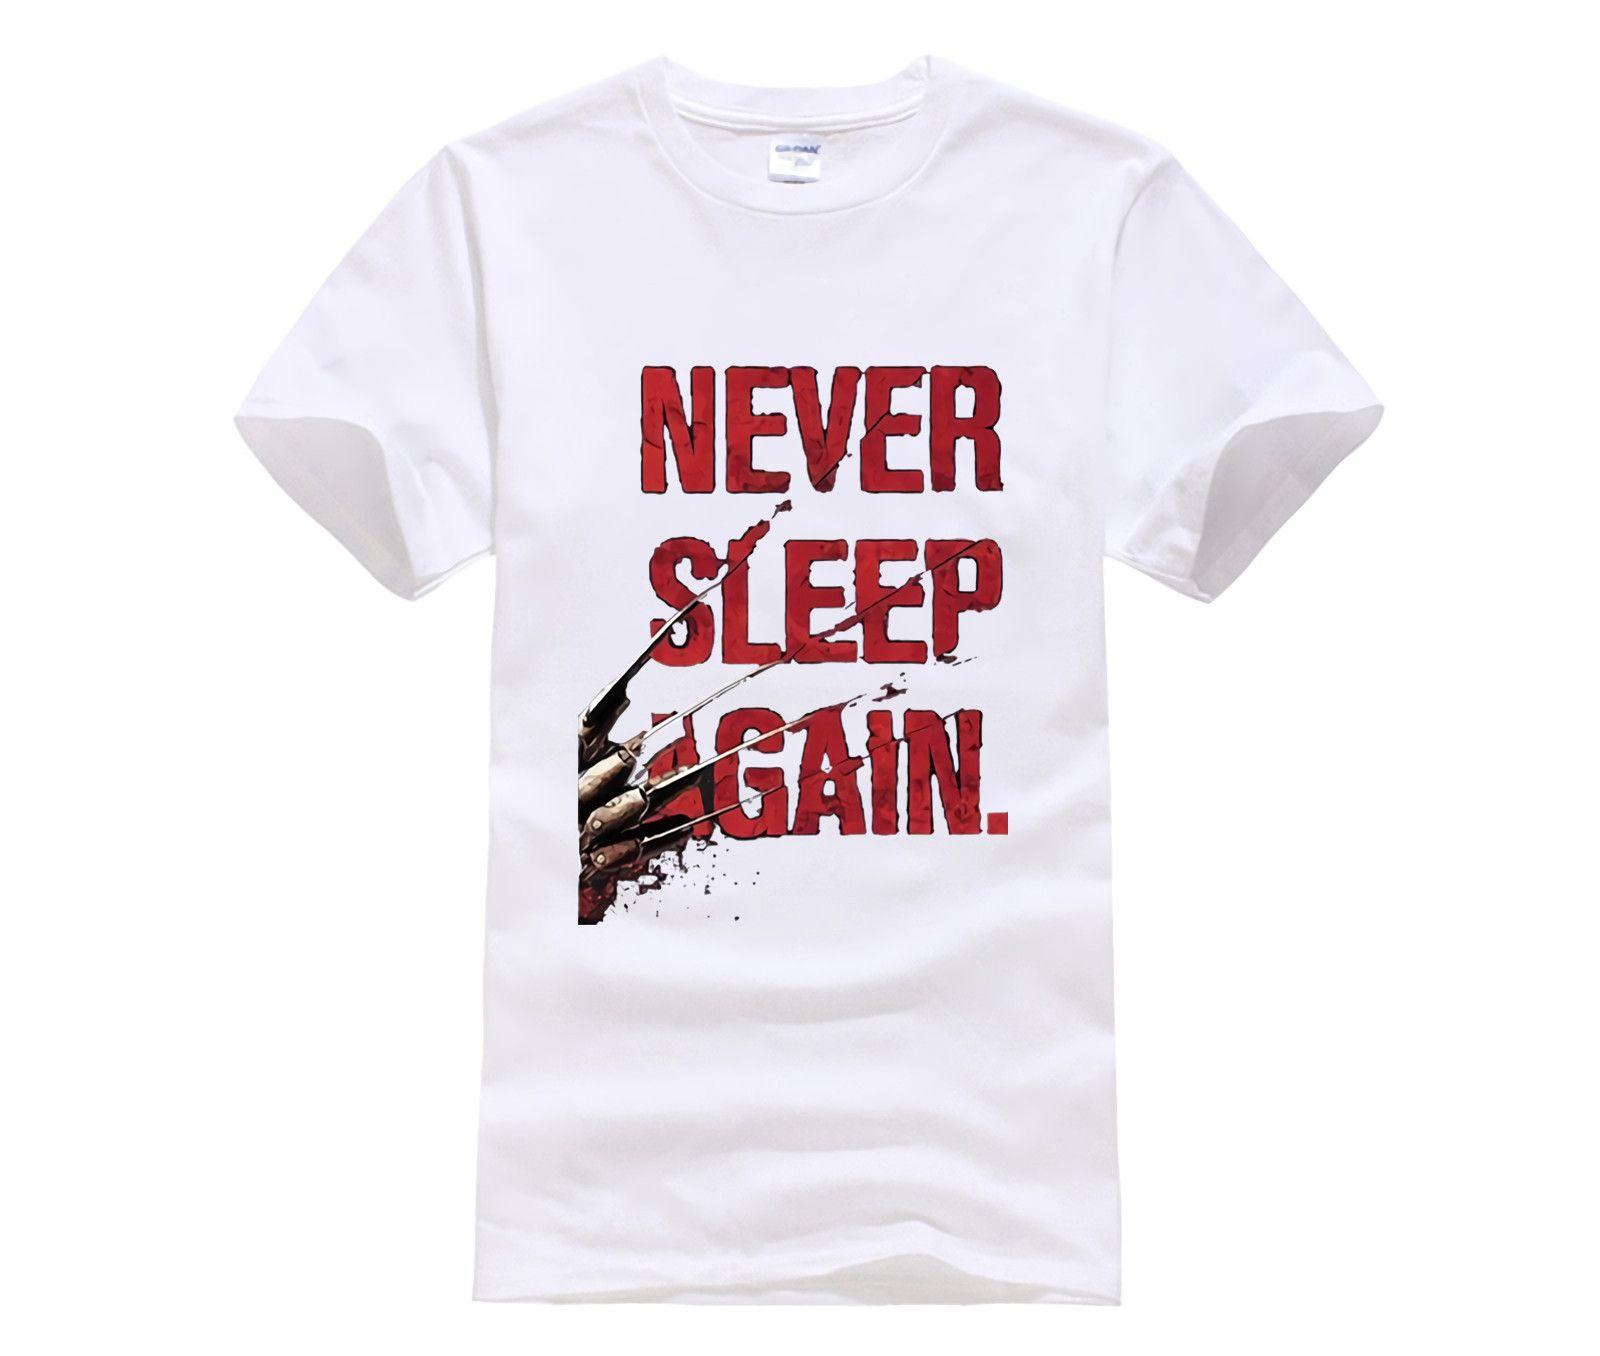 Новая мода Марка Одежда Печать Шею Man Freddy Krueger Never Sleep Again Top Tee 100% хлопок Футболка